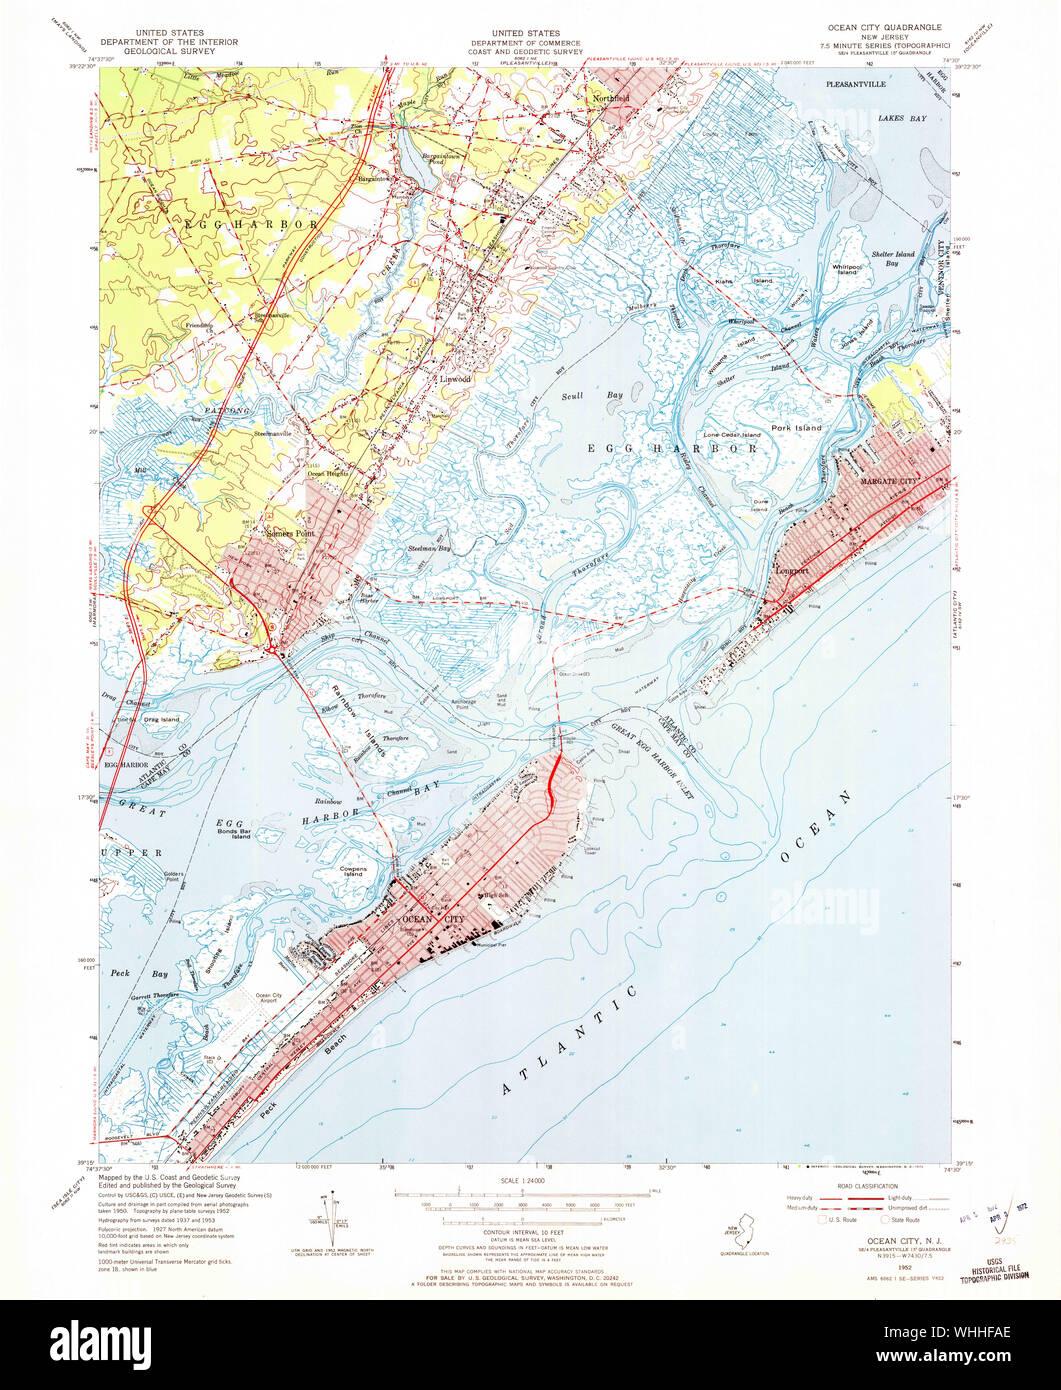 USGS TOPO Map New Jersey NJ Ocean City 254660 1952 24000 ... Map Ocean City Nj on rio grande, bethany beach, ocean county nj map, long beach island nj map, ocean city boardwalk, ocean city md map, camden nj map, lbi nj map, ocean city maryland, ocean city high school, cape may, wildwood crest, ocean city parking map, sandy hook, beach haven nj map, cape may nj map, sea isle city, toms river nj map, ocean city boardwalk map, ventnor nj map, ocean city new jersey hotels, mystic island nj map, ocean county, north wildwood, avalon nj map, toms river, long beach island, cherry hill township nj map, seaside park nj map, point pleasant nj map, jersey city, ocean city new jersey streets, stone harbor, ocnj street map, atlantic city, asbury park, cape may county,